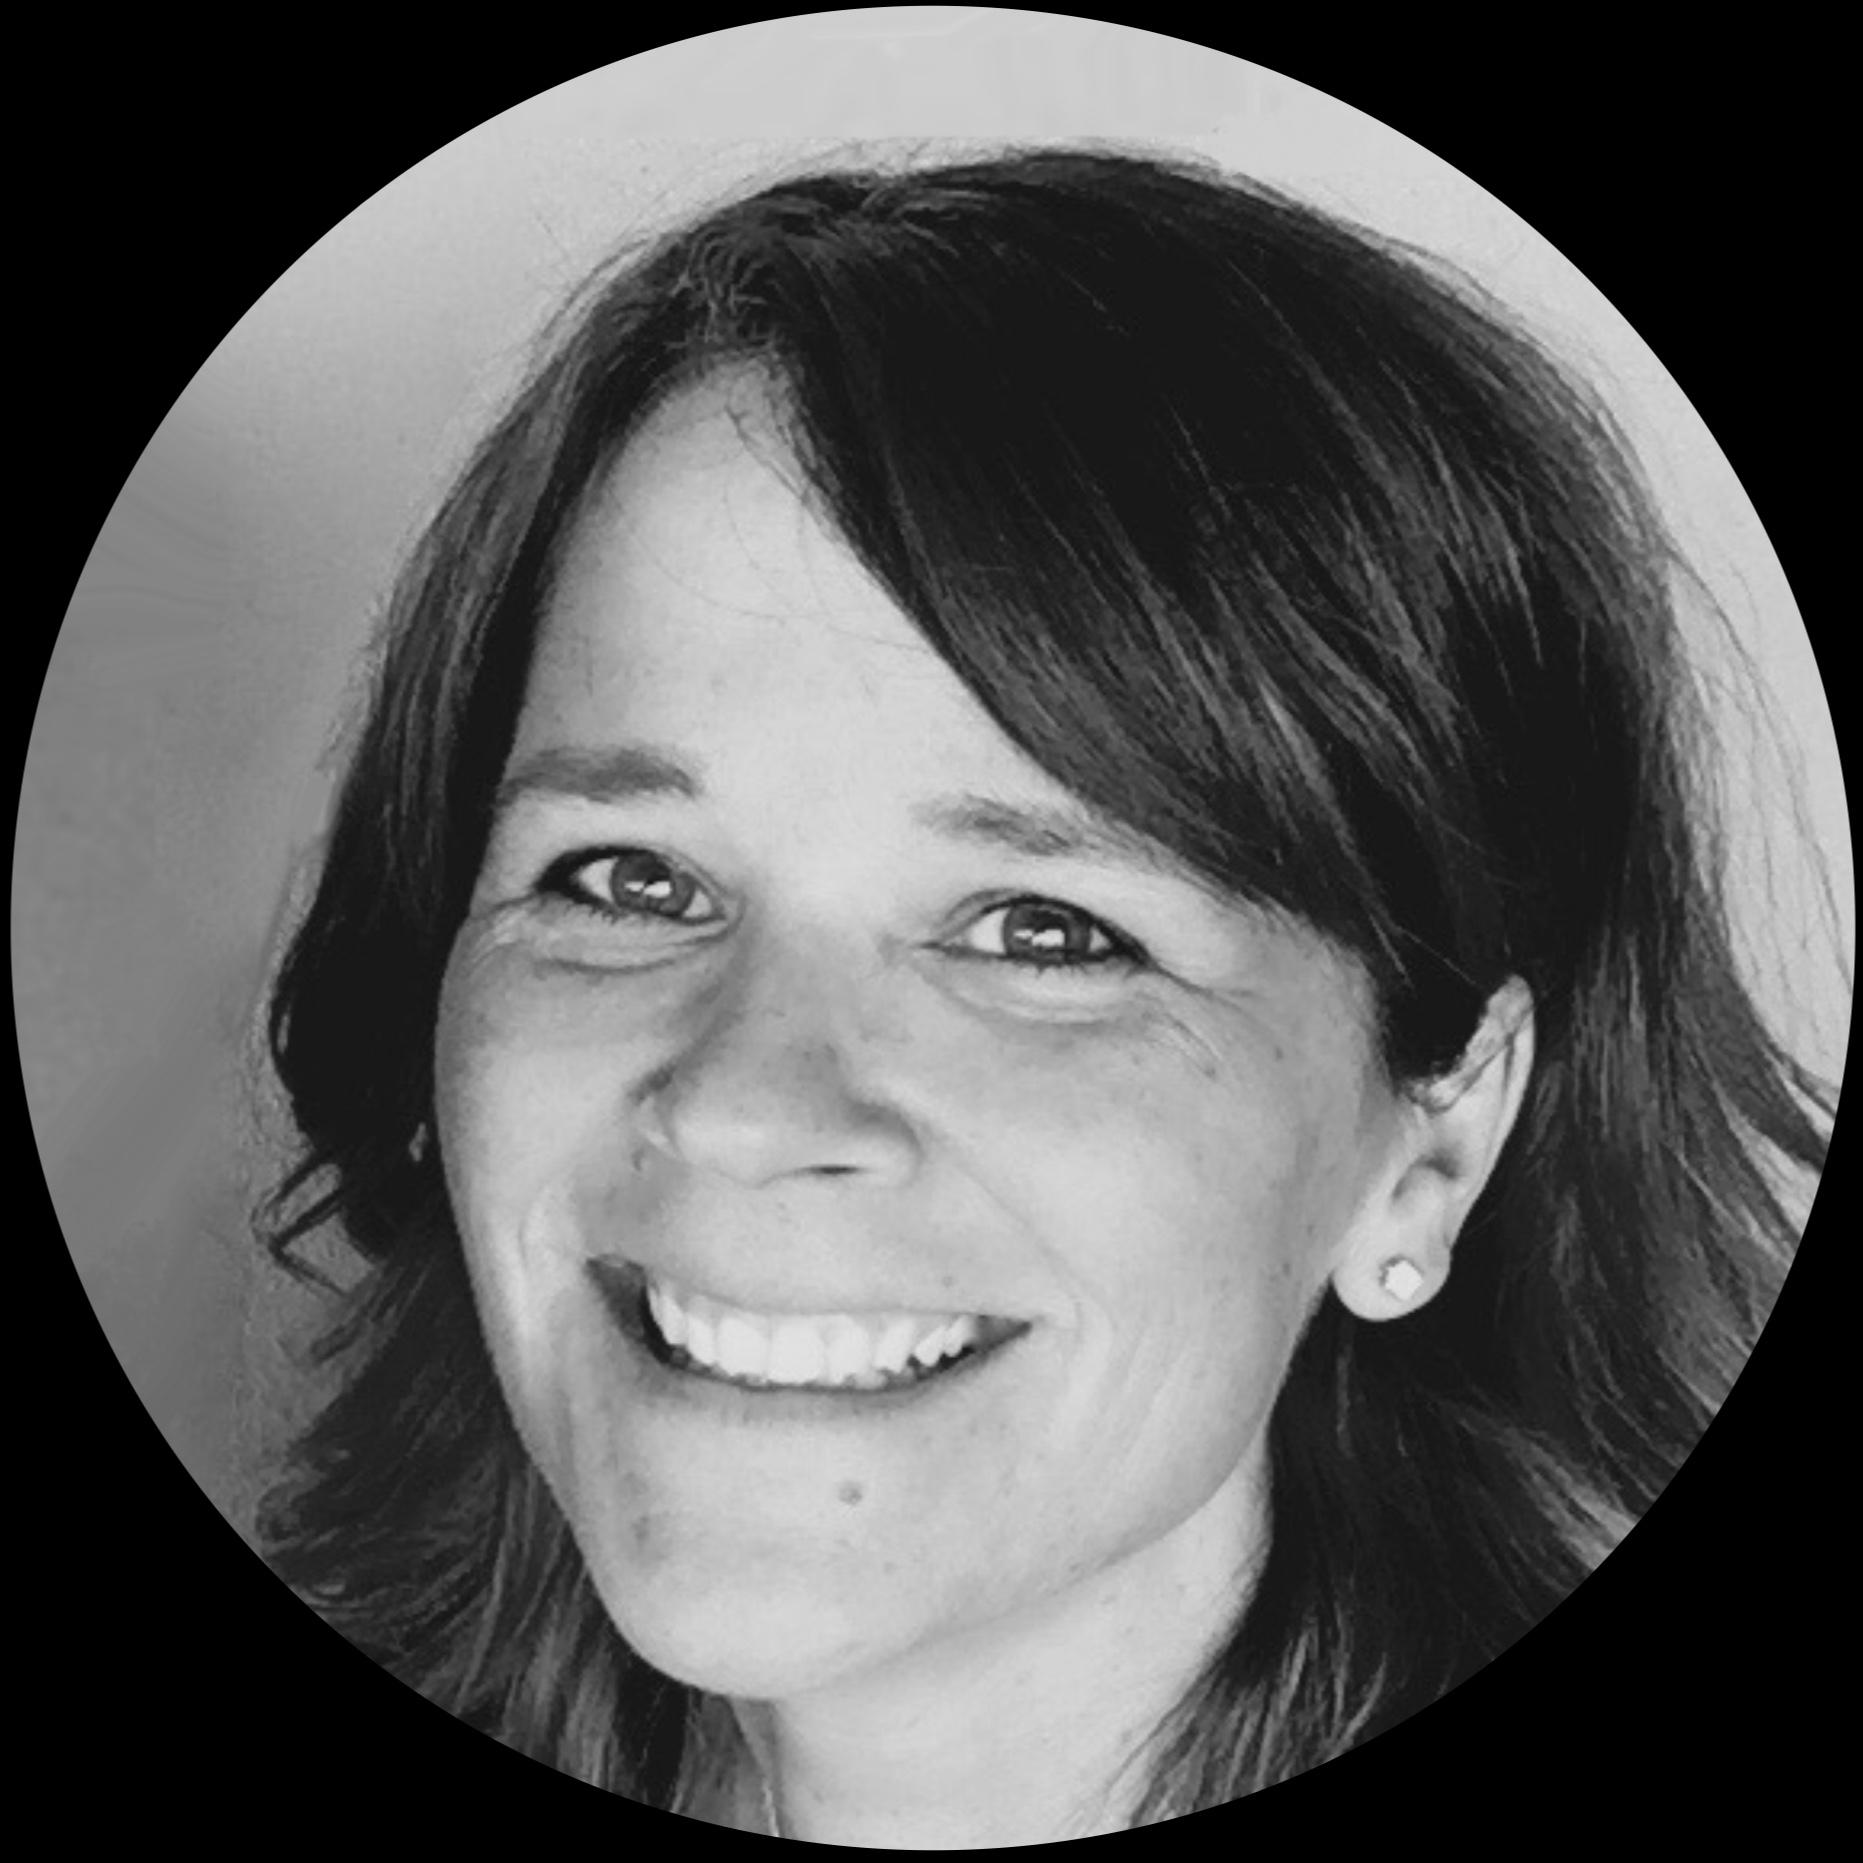 Leah Davidson - Leader of The Group - Mornington Peninsula